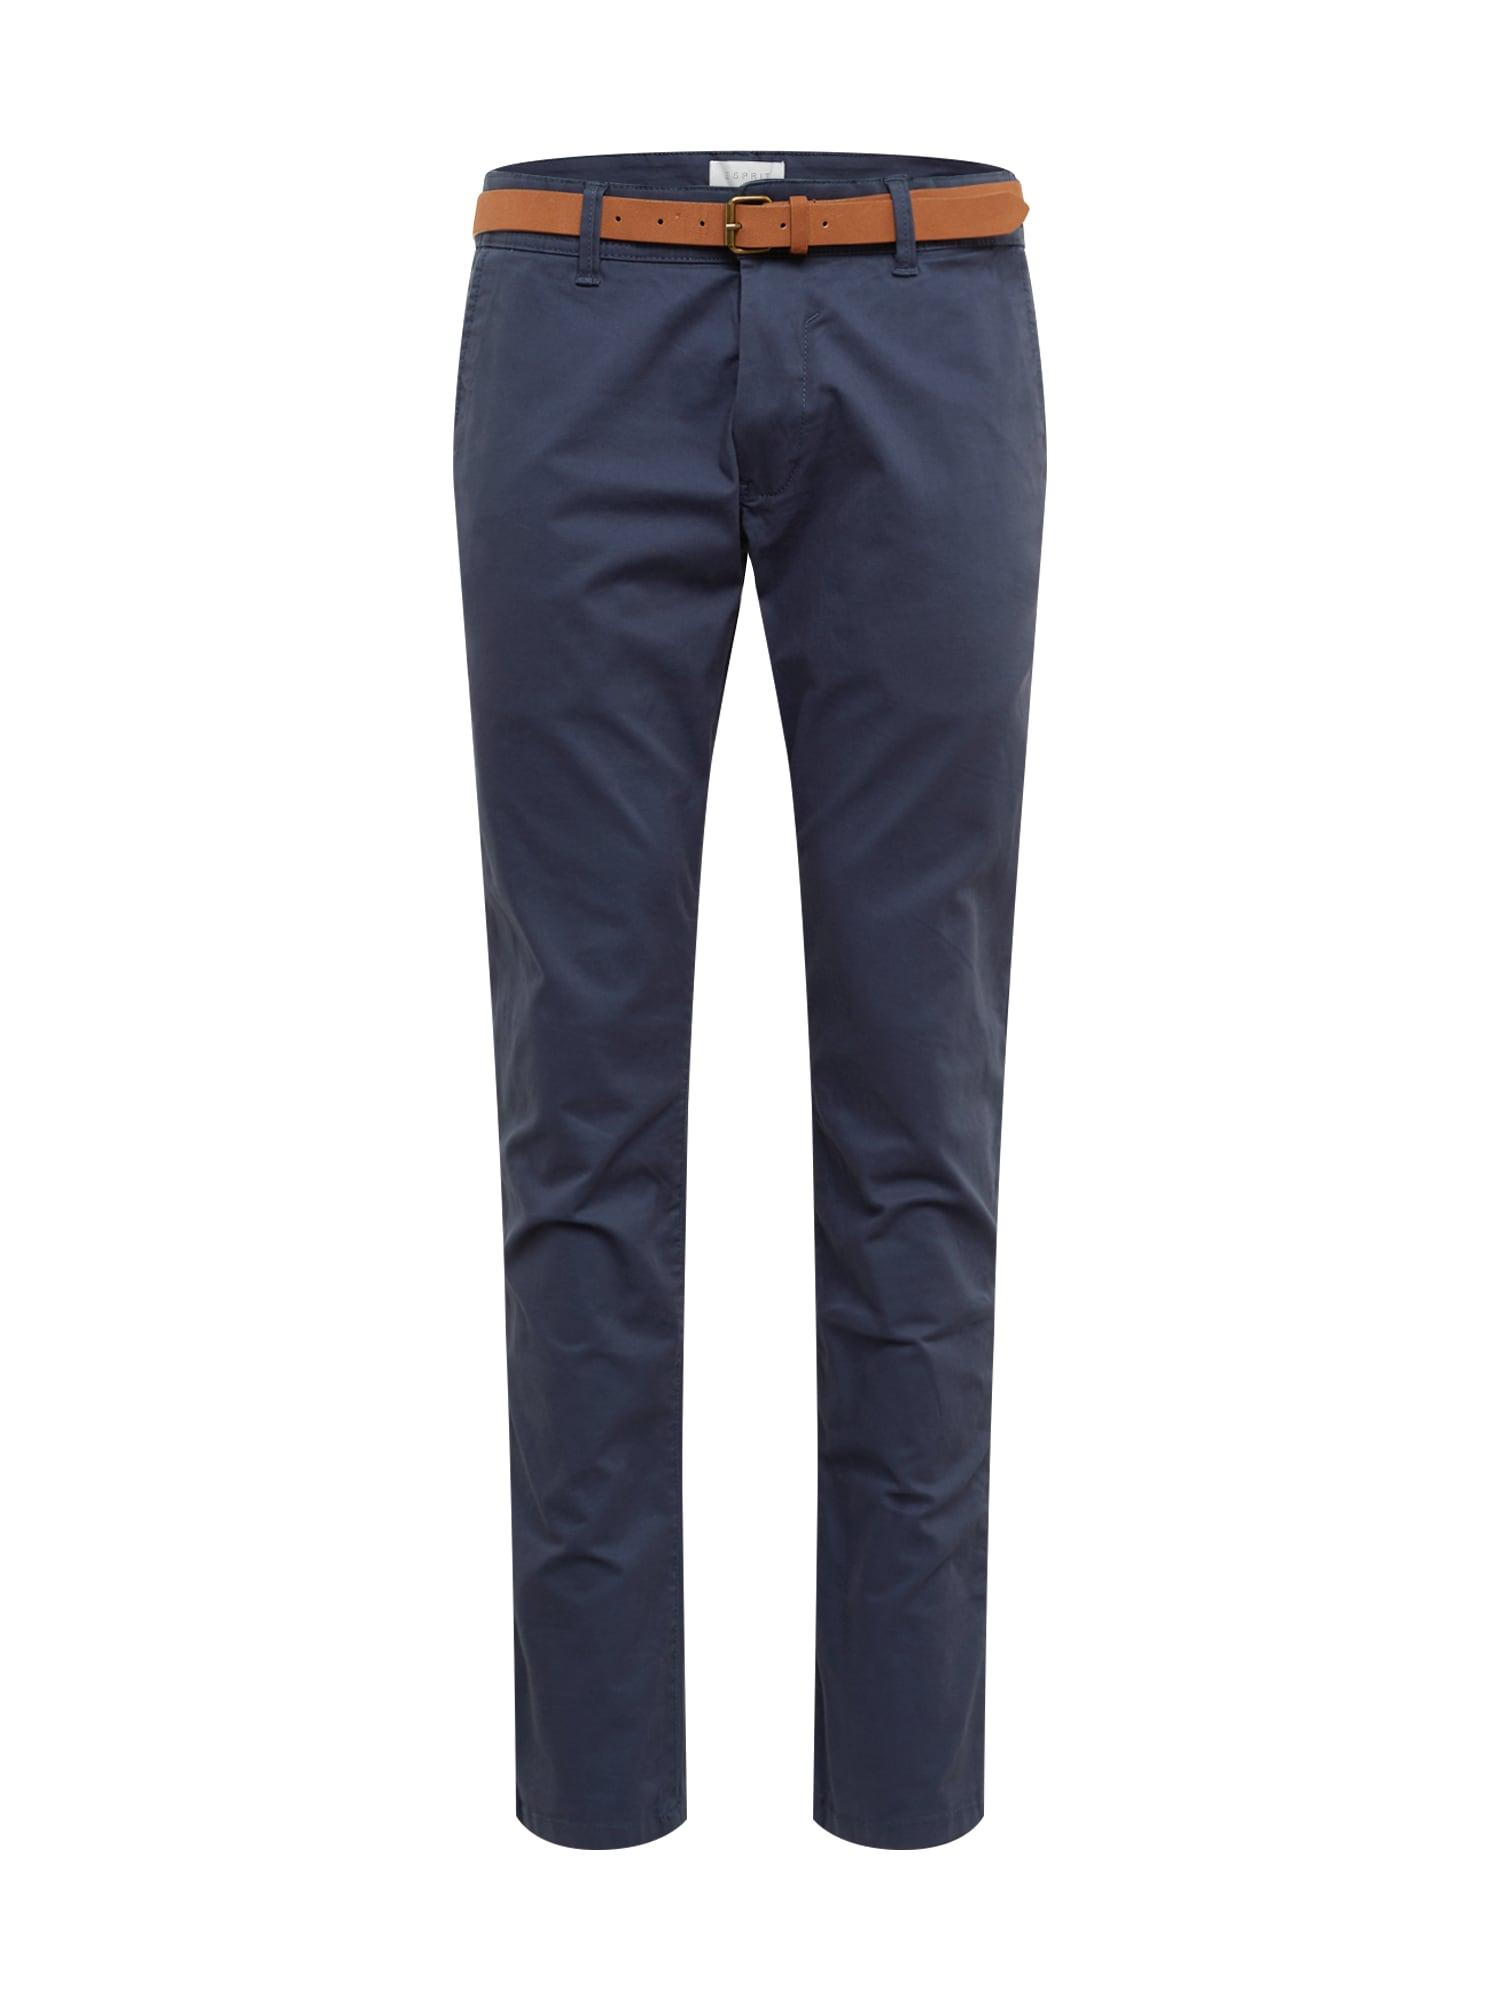 Chino kalhoty NOOS Chino modrá ESPRIT